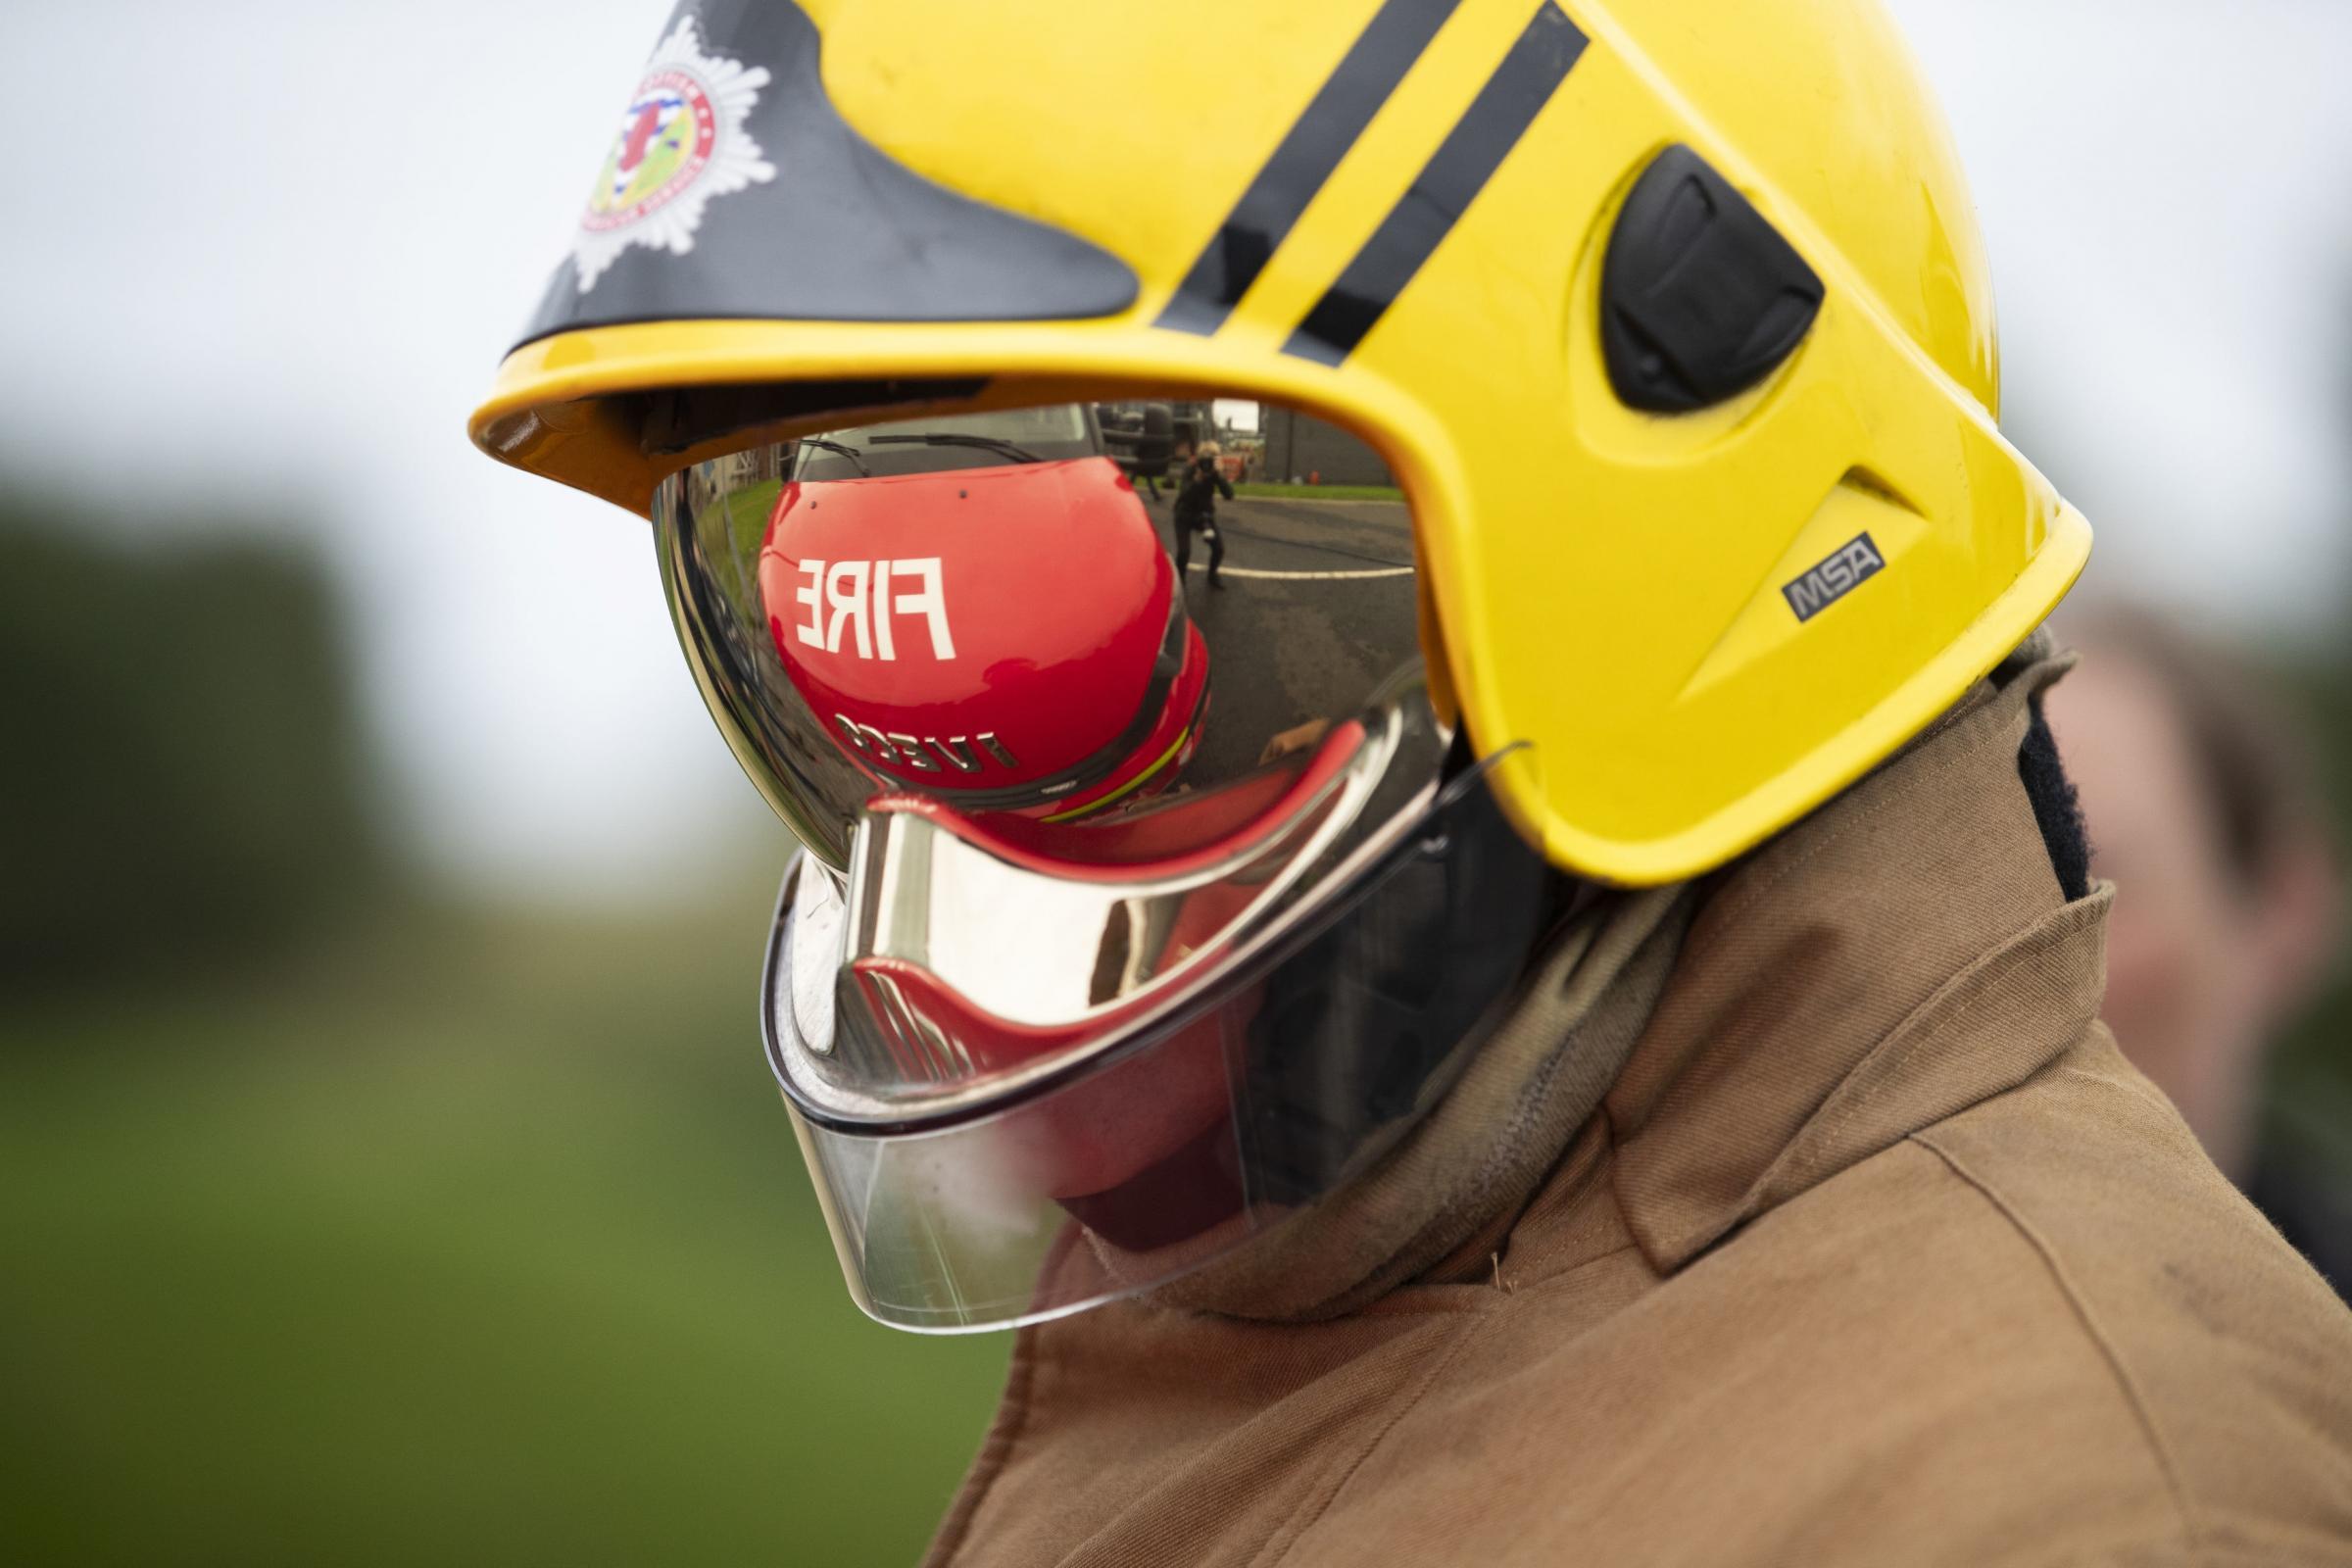 Firefighters extinguish large blaze at business park